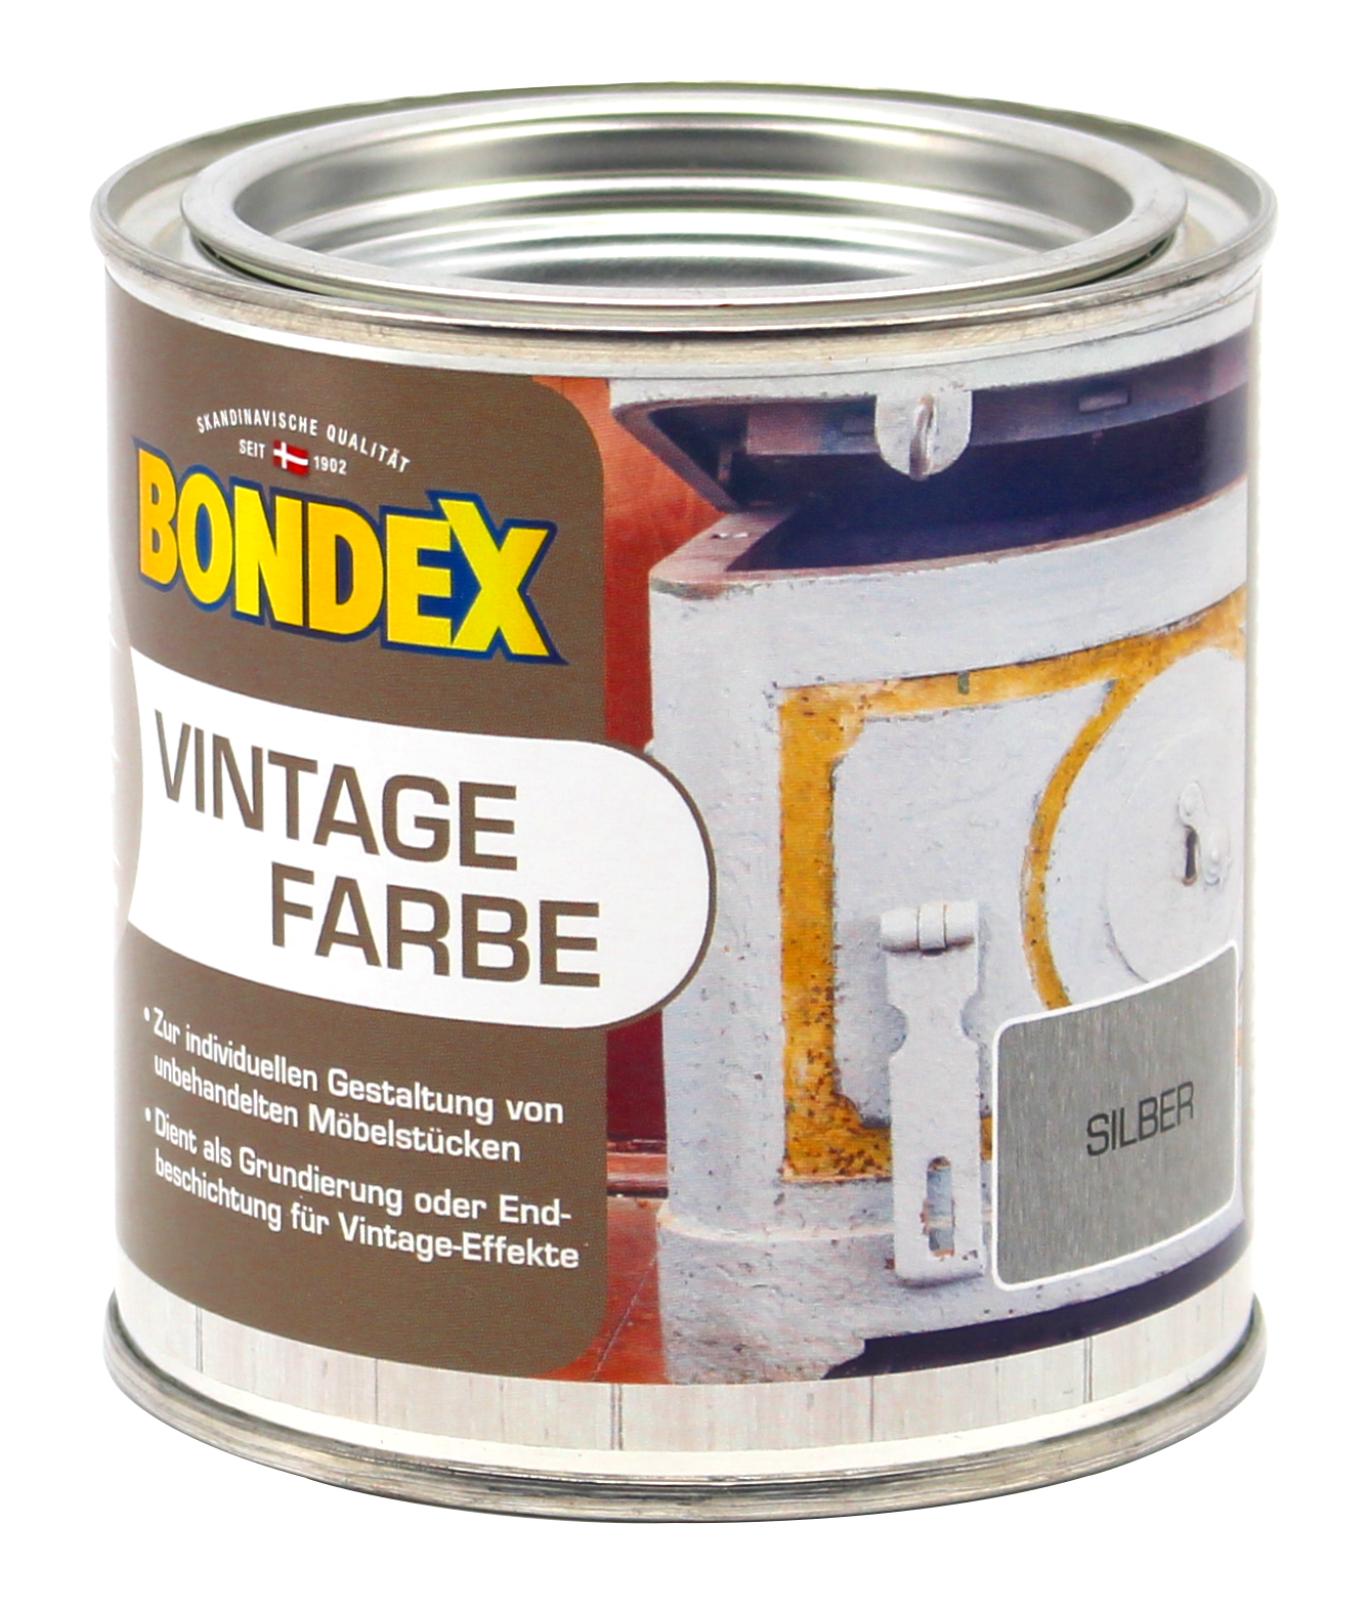 bondex vintage farbe silber holzfarbe holz m bel innen 0. Black Bedroom Furniture Sets. Home Design Ideas